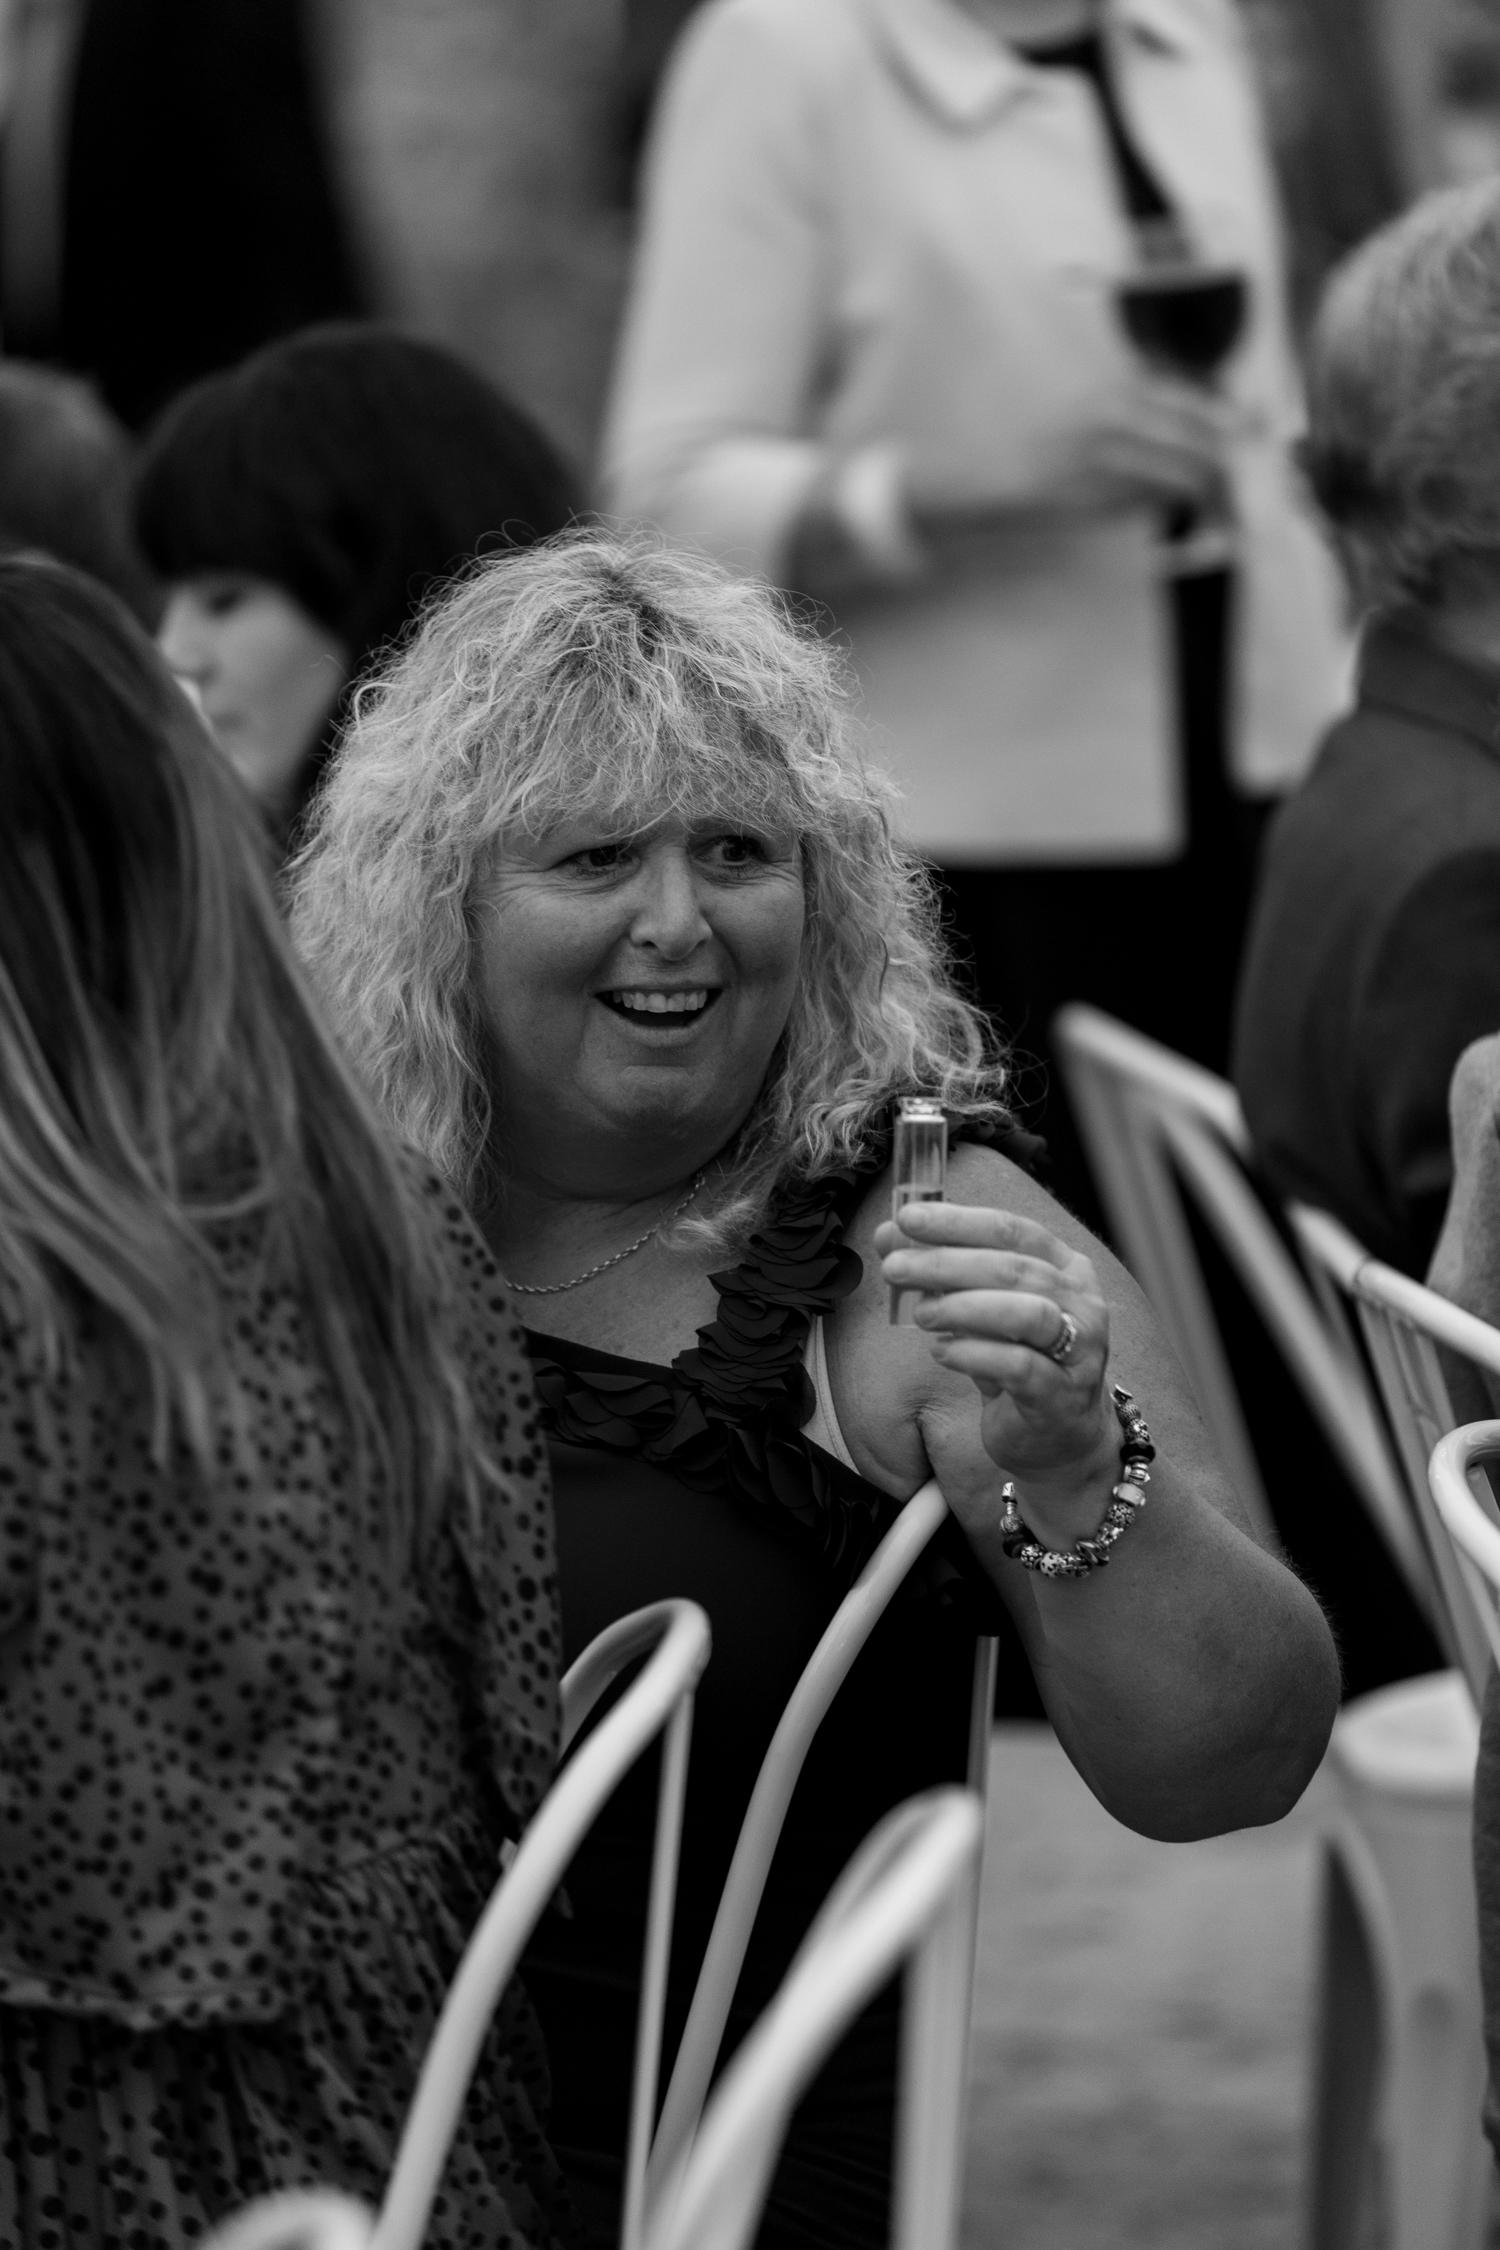 black-barn-winery-wedding-hawkes-bay-wedding-photographer-aunty-doing-shots.jpg